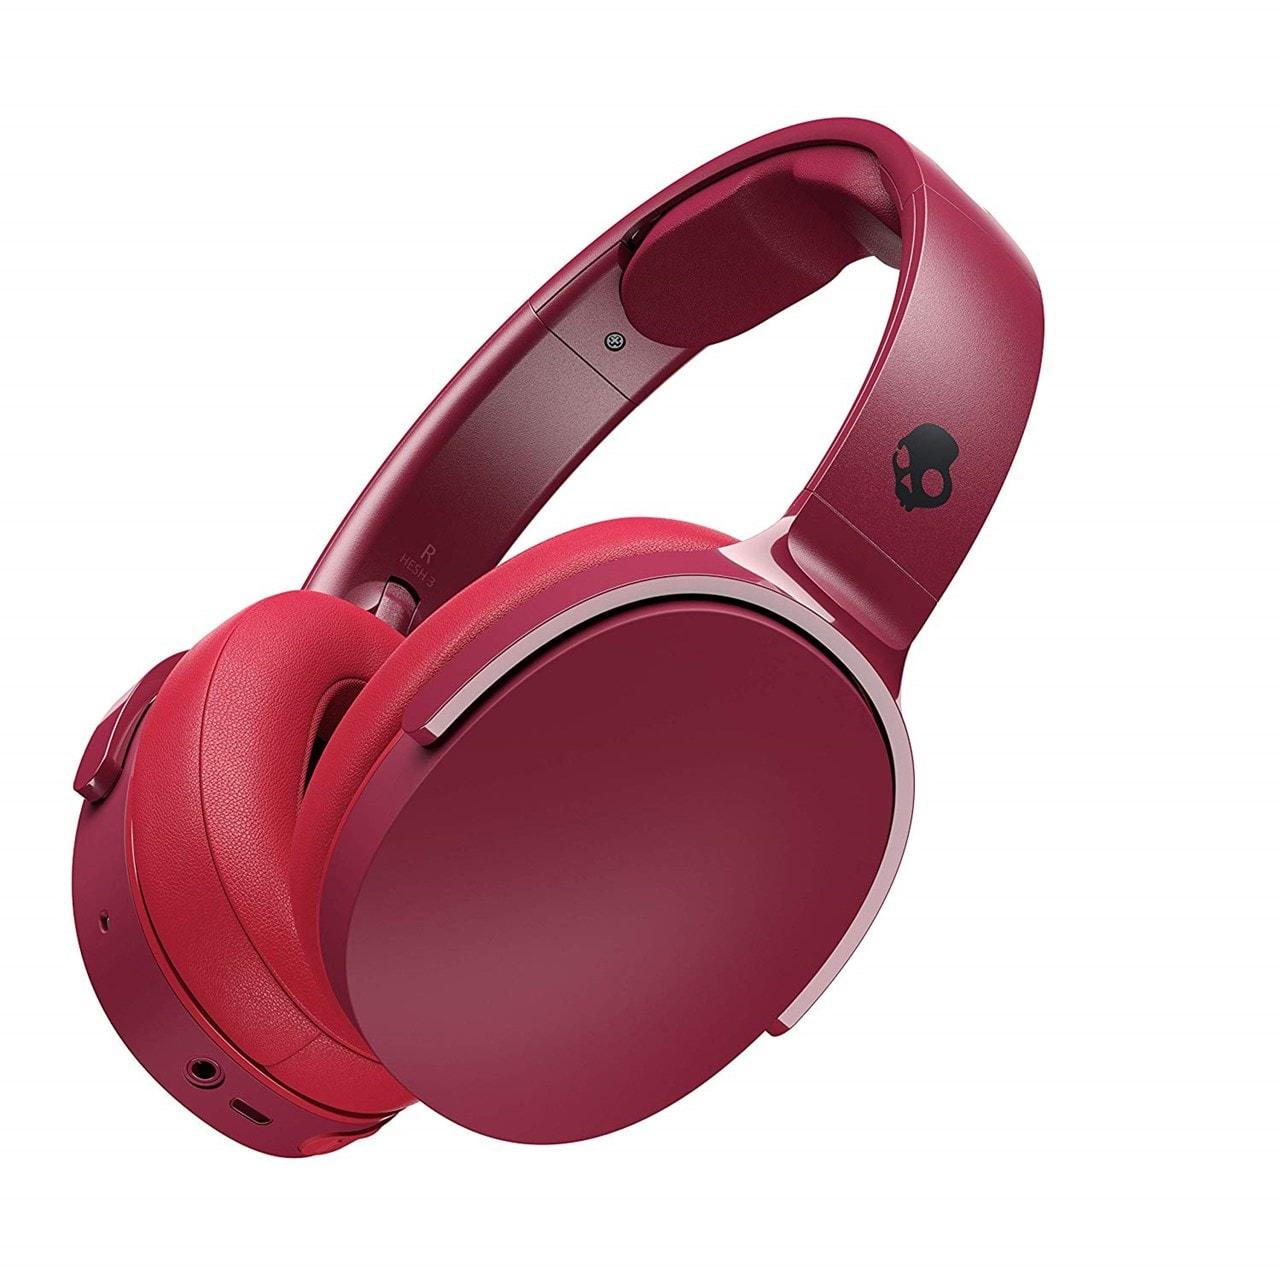 Skullcandy Hesh 3 Moab Red Bluetooth Headphones - 2